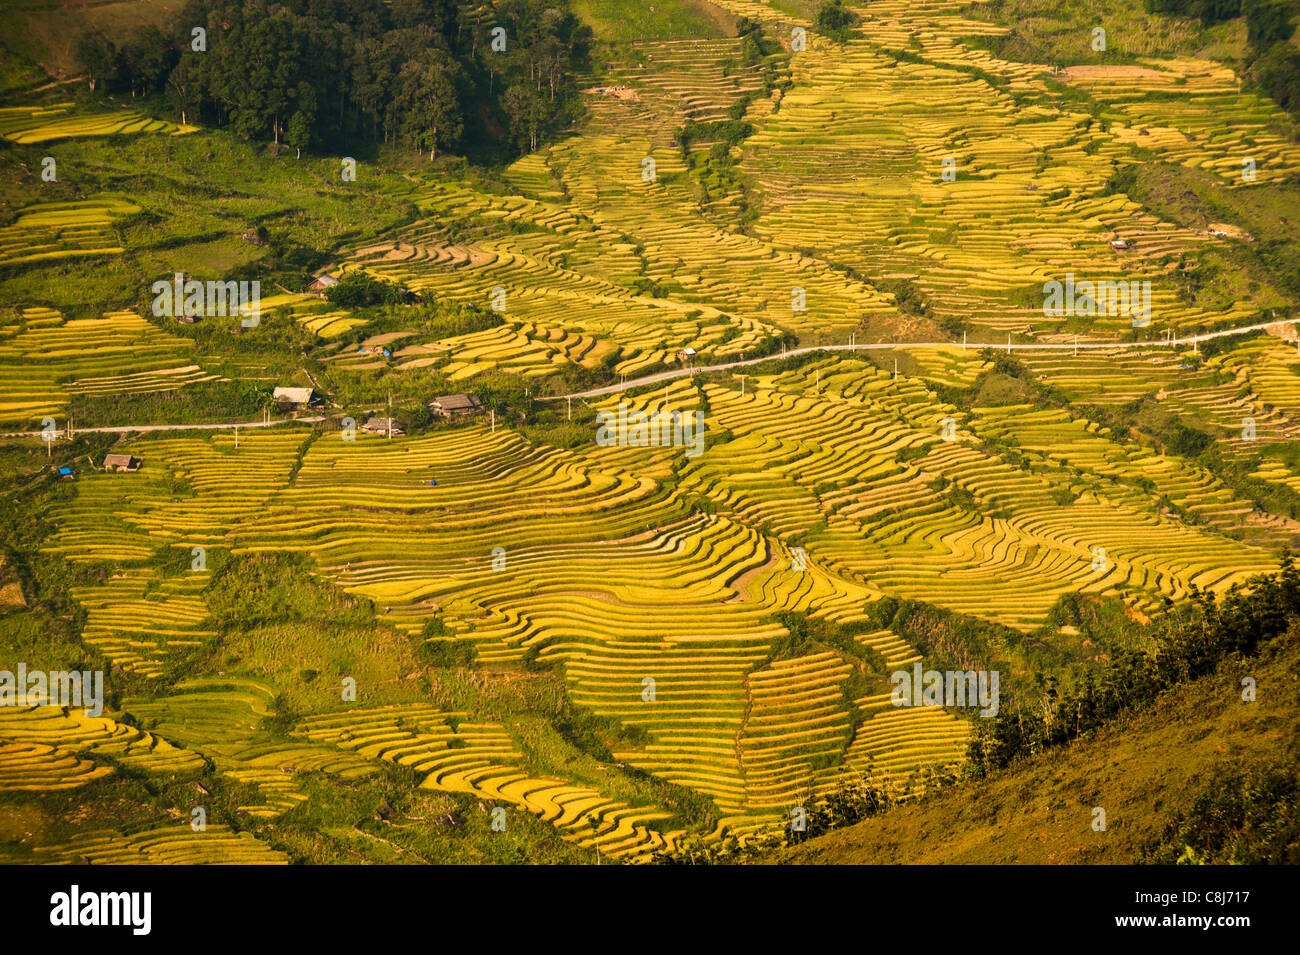 Rice terraces, North Vietnam - Stock Image